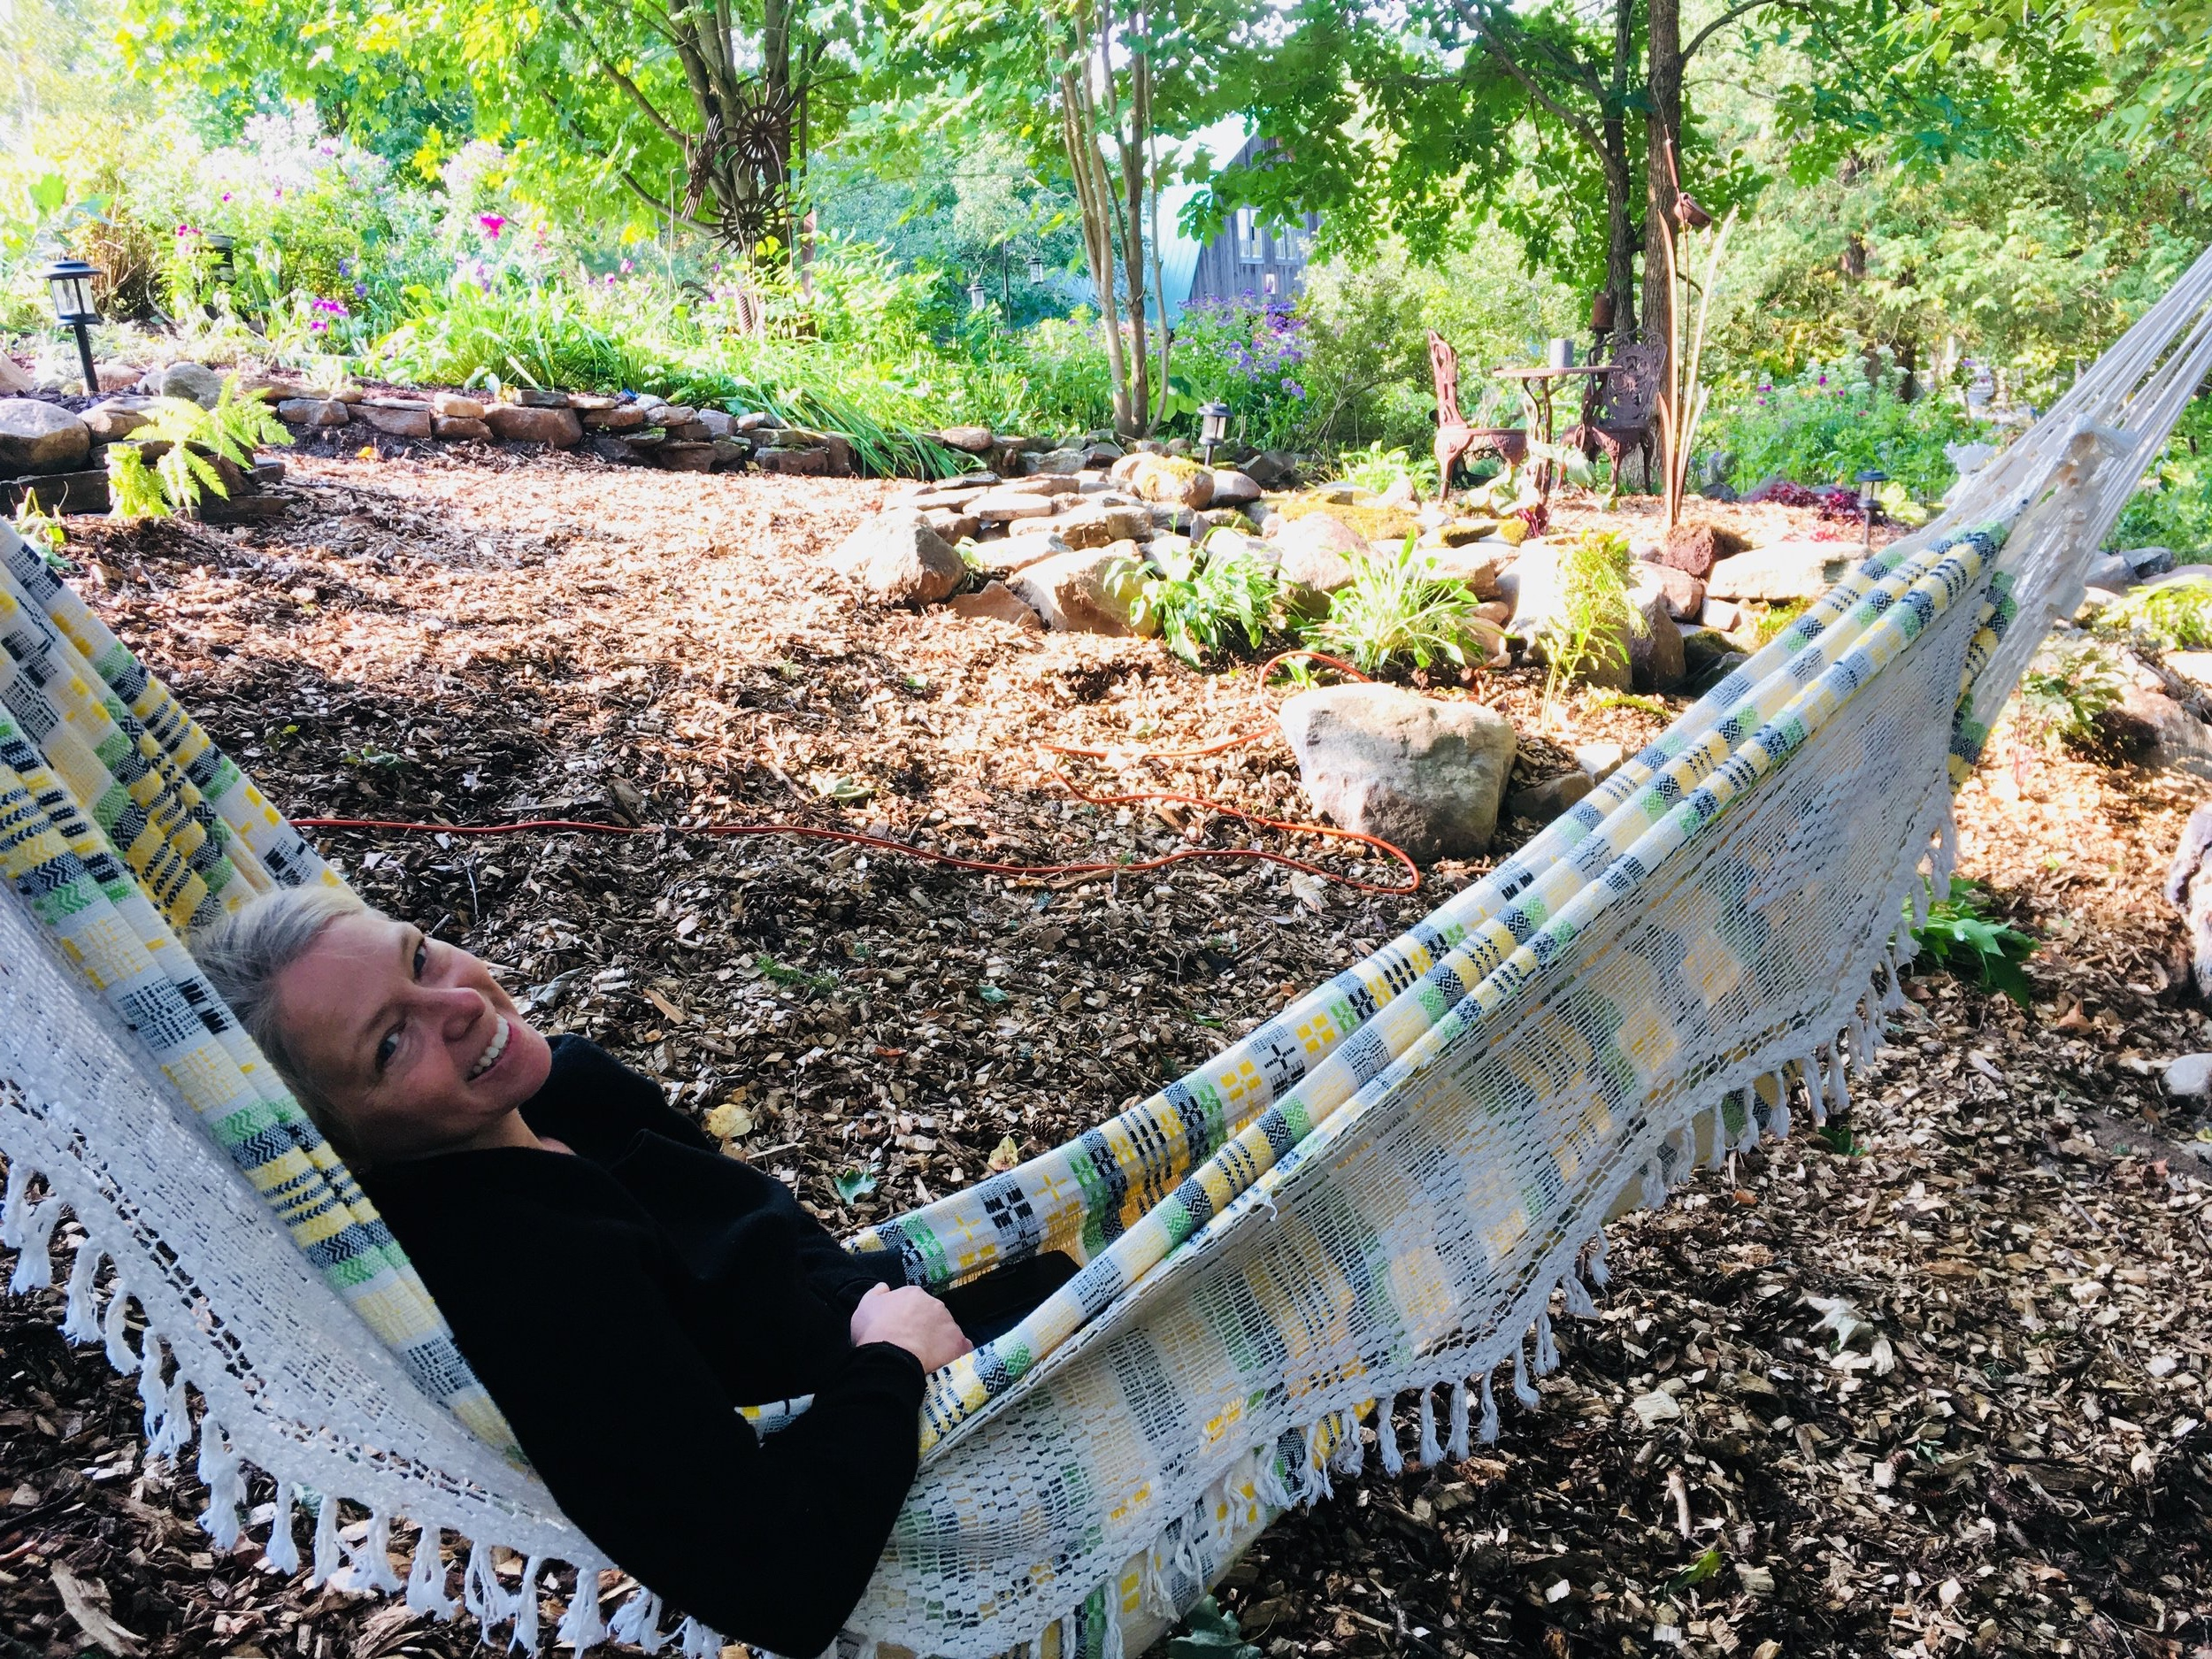 tara+in+hammock.jpg